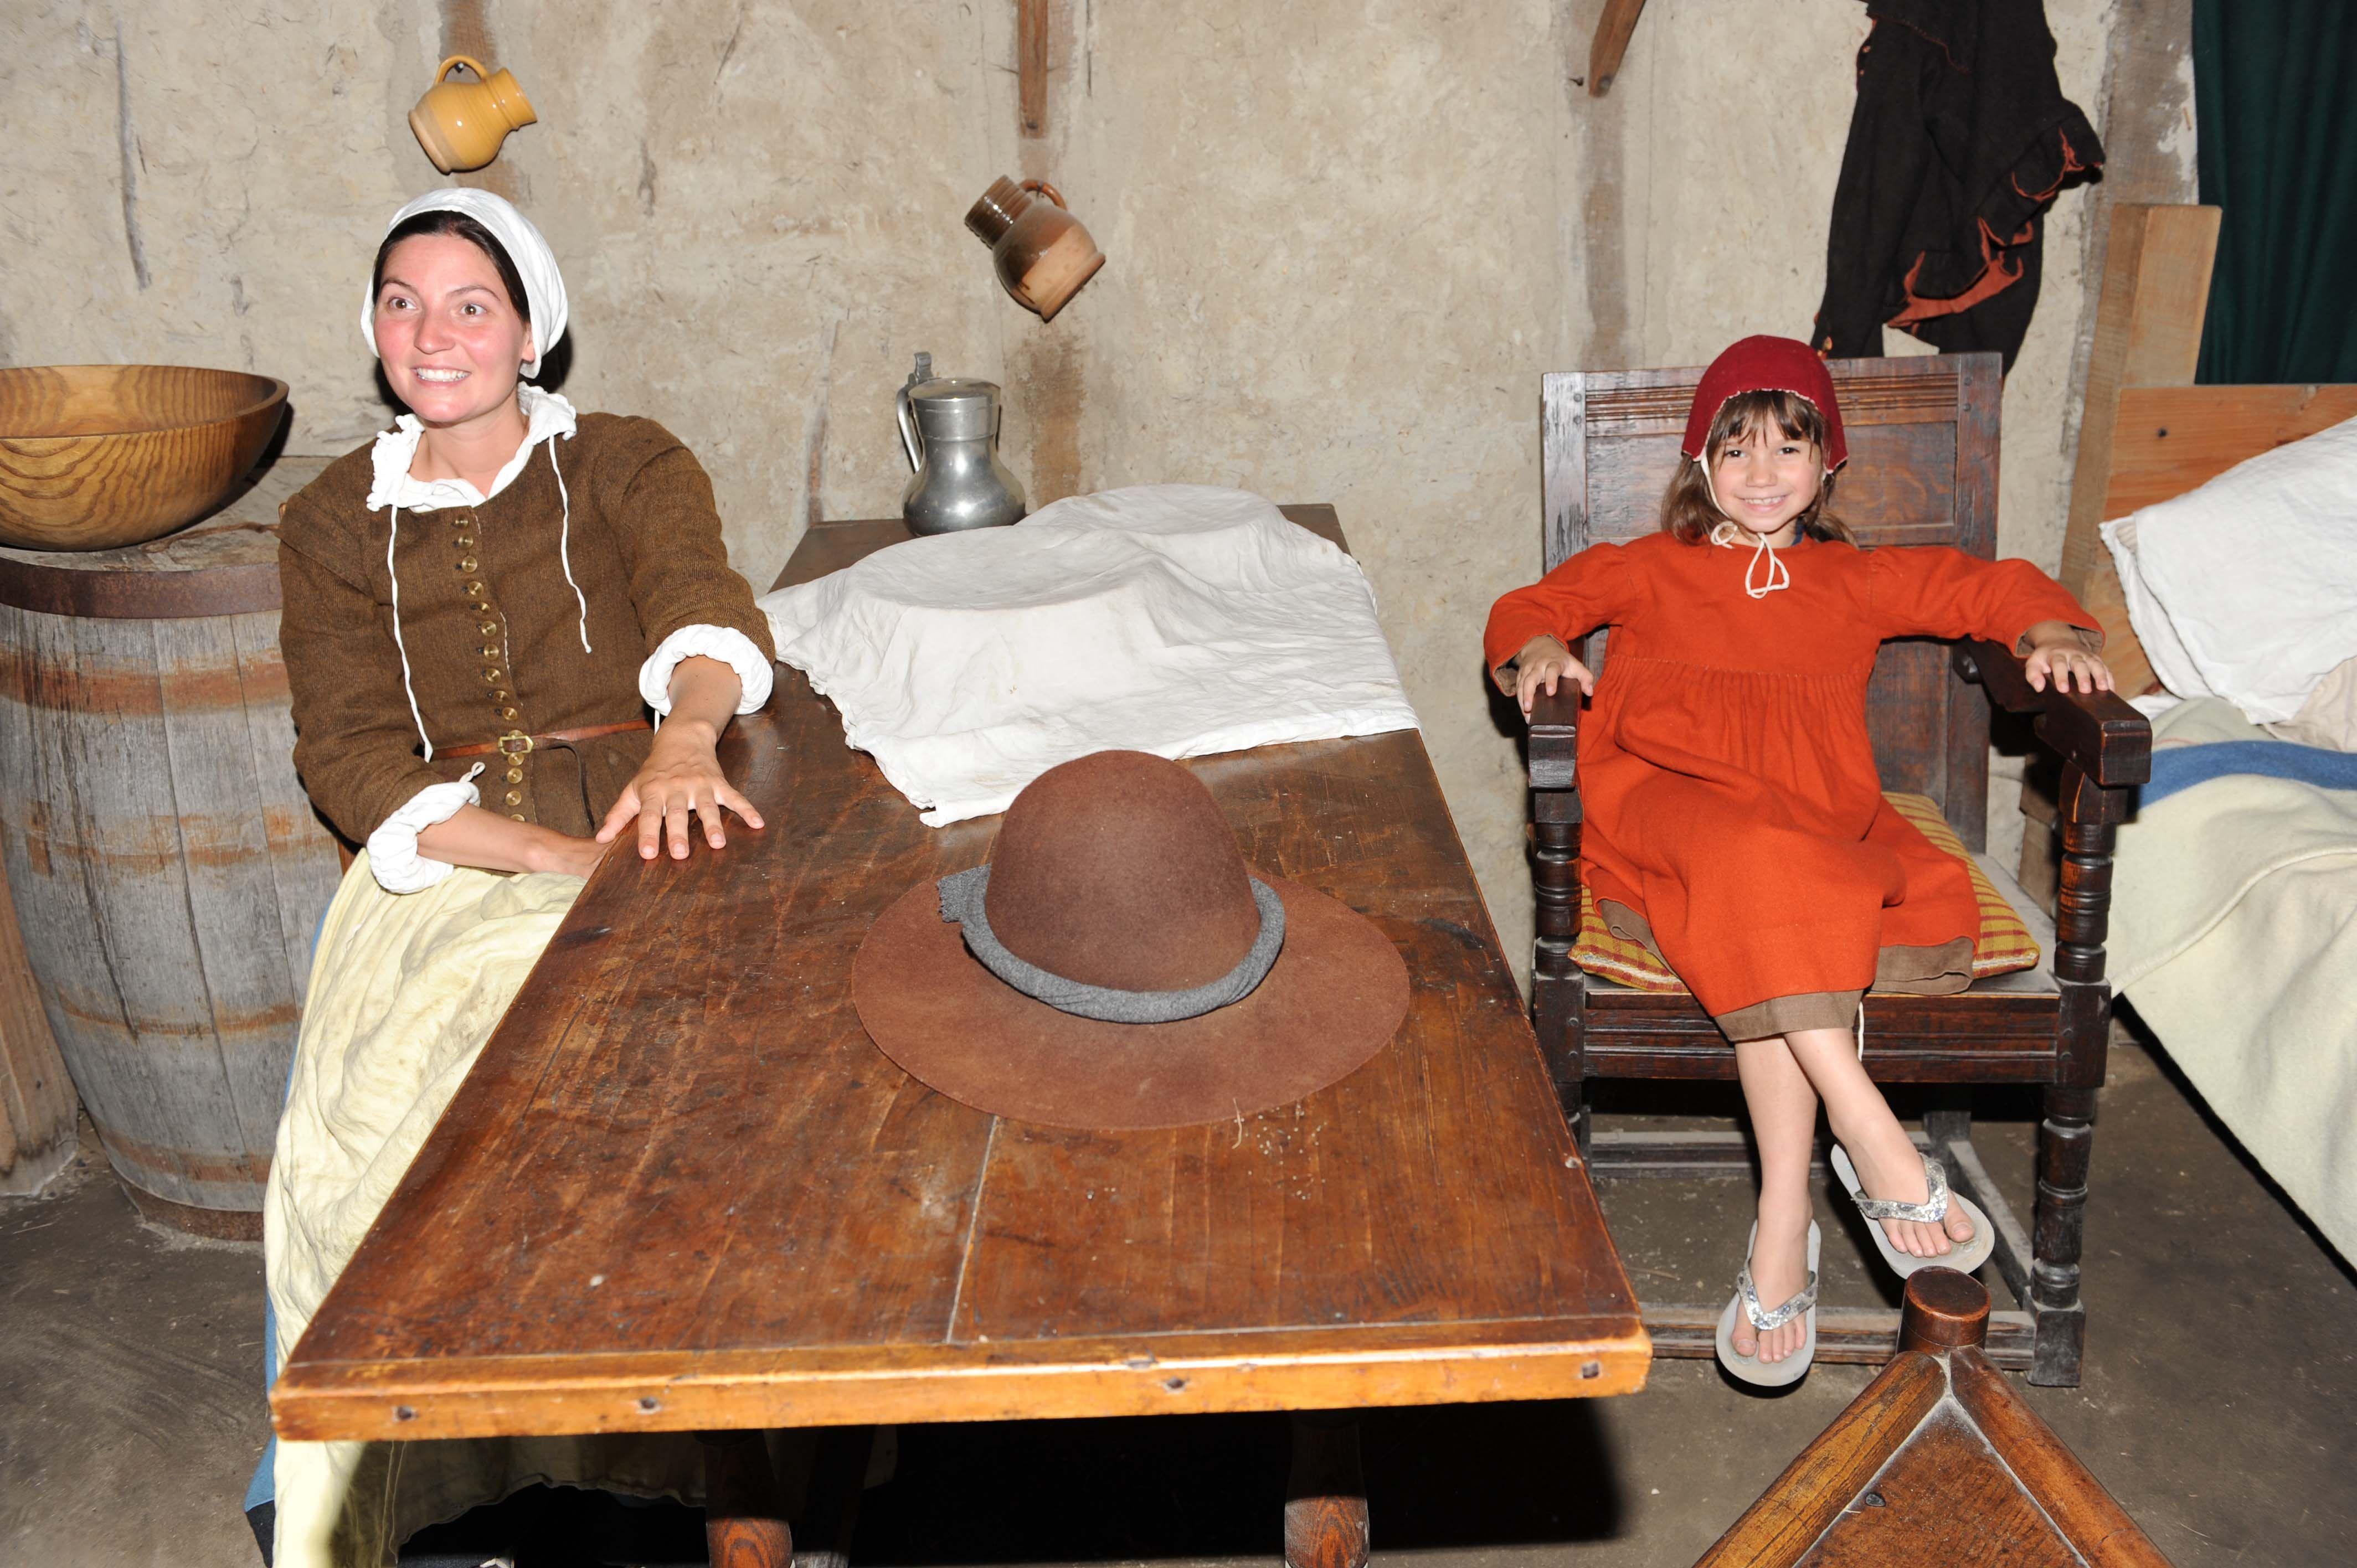 pilgrims plimoth Google Search Pilgrim, Plymouth, Tour